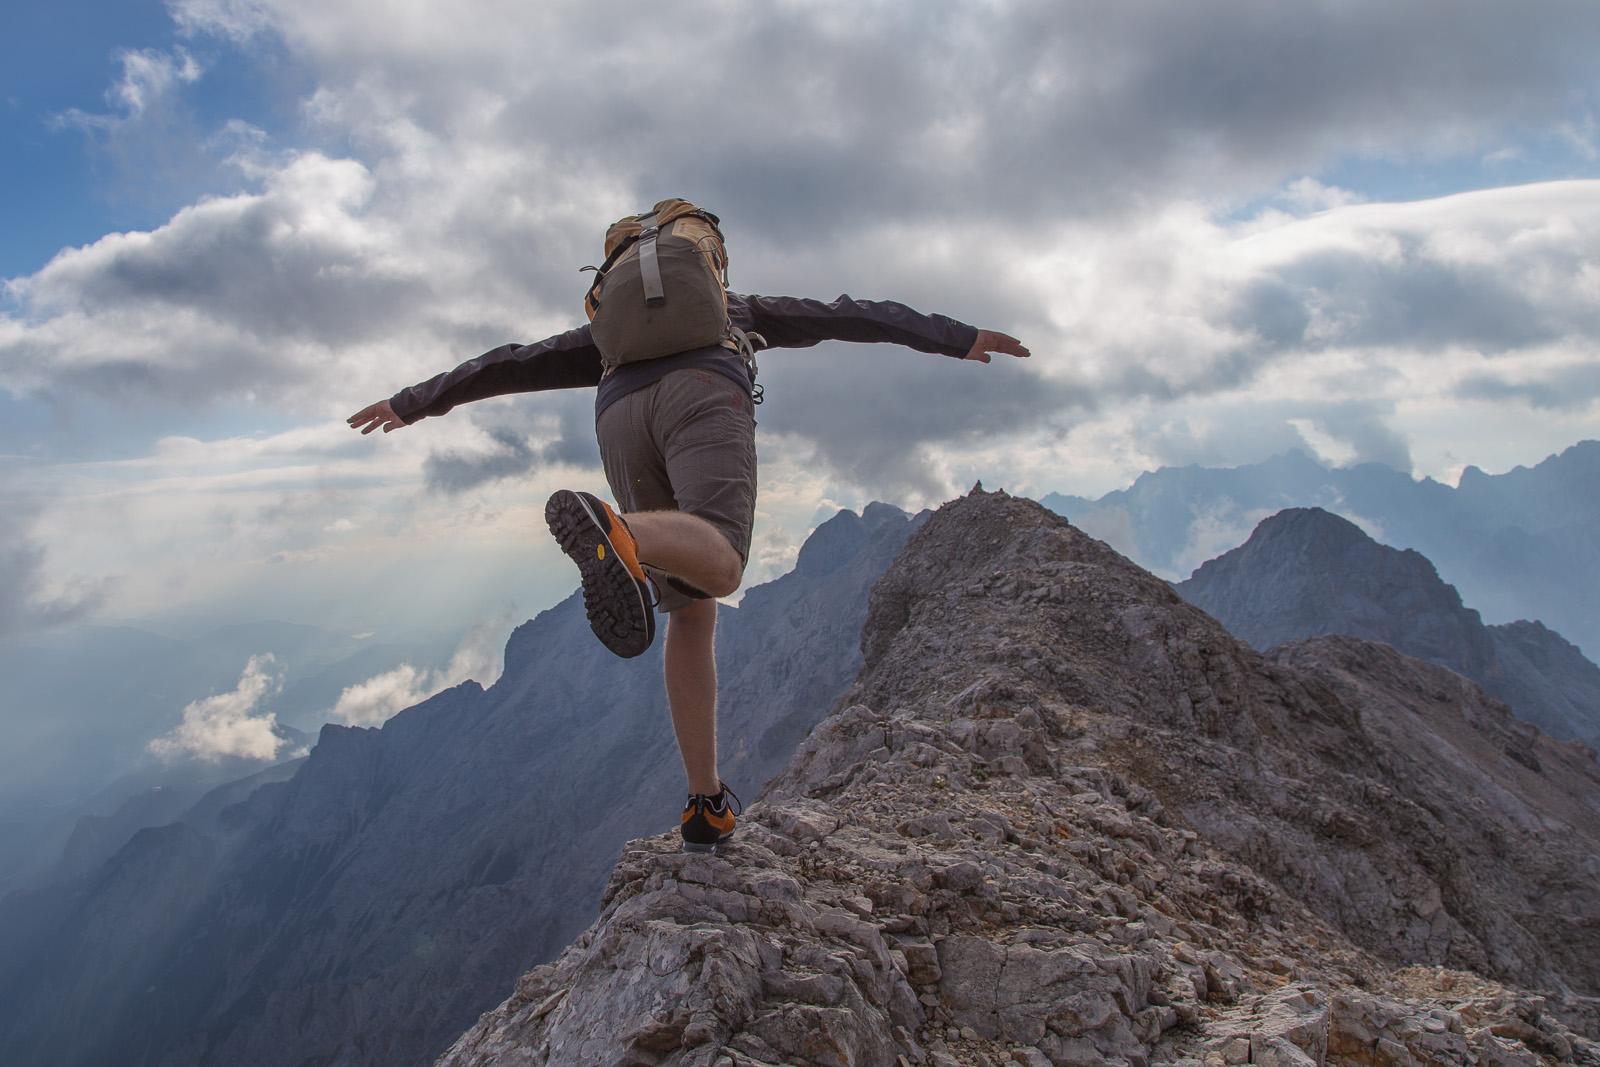 Klettersteig Höllental : Jubiläumsgrat über höllental climb and hike